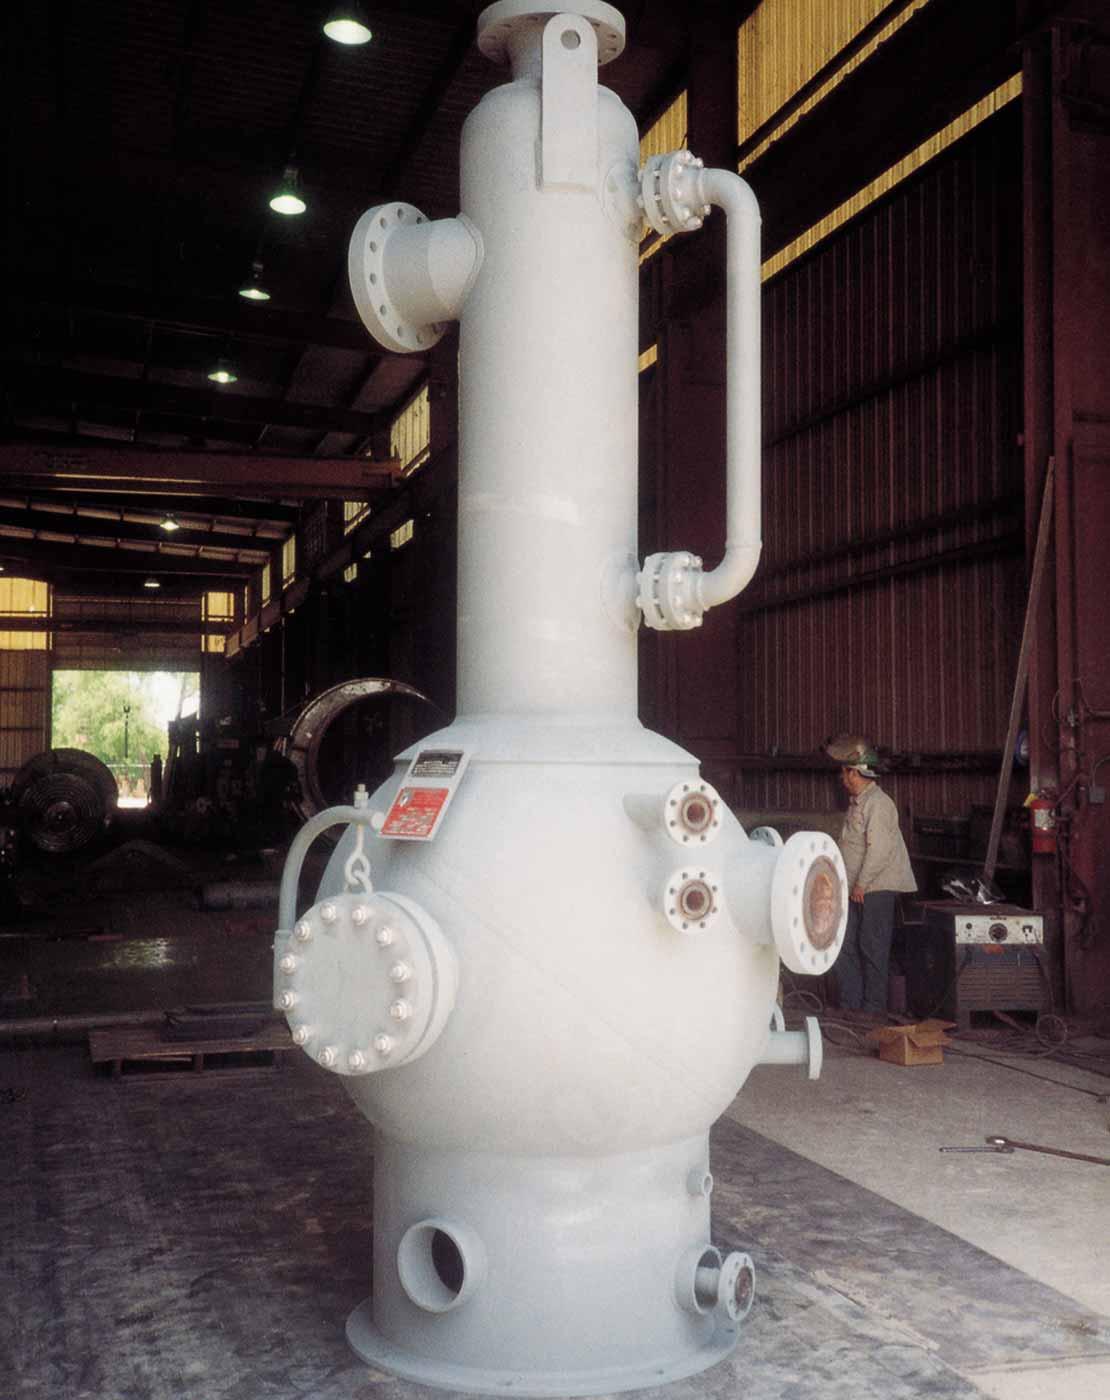 PORTA-TEST WHIRLYSCRUB V  gas scrubber